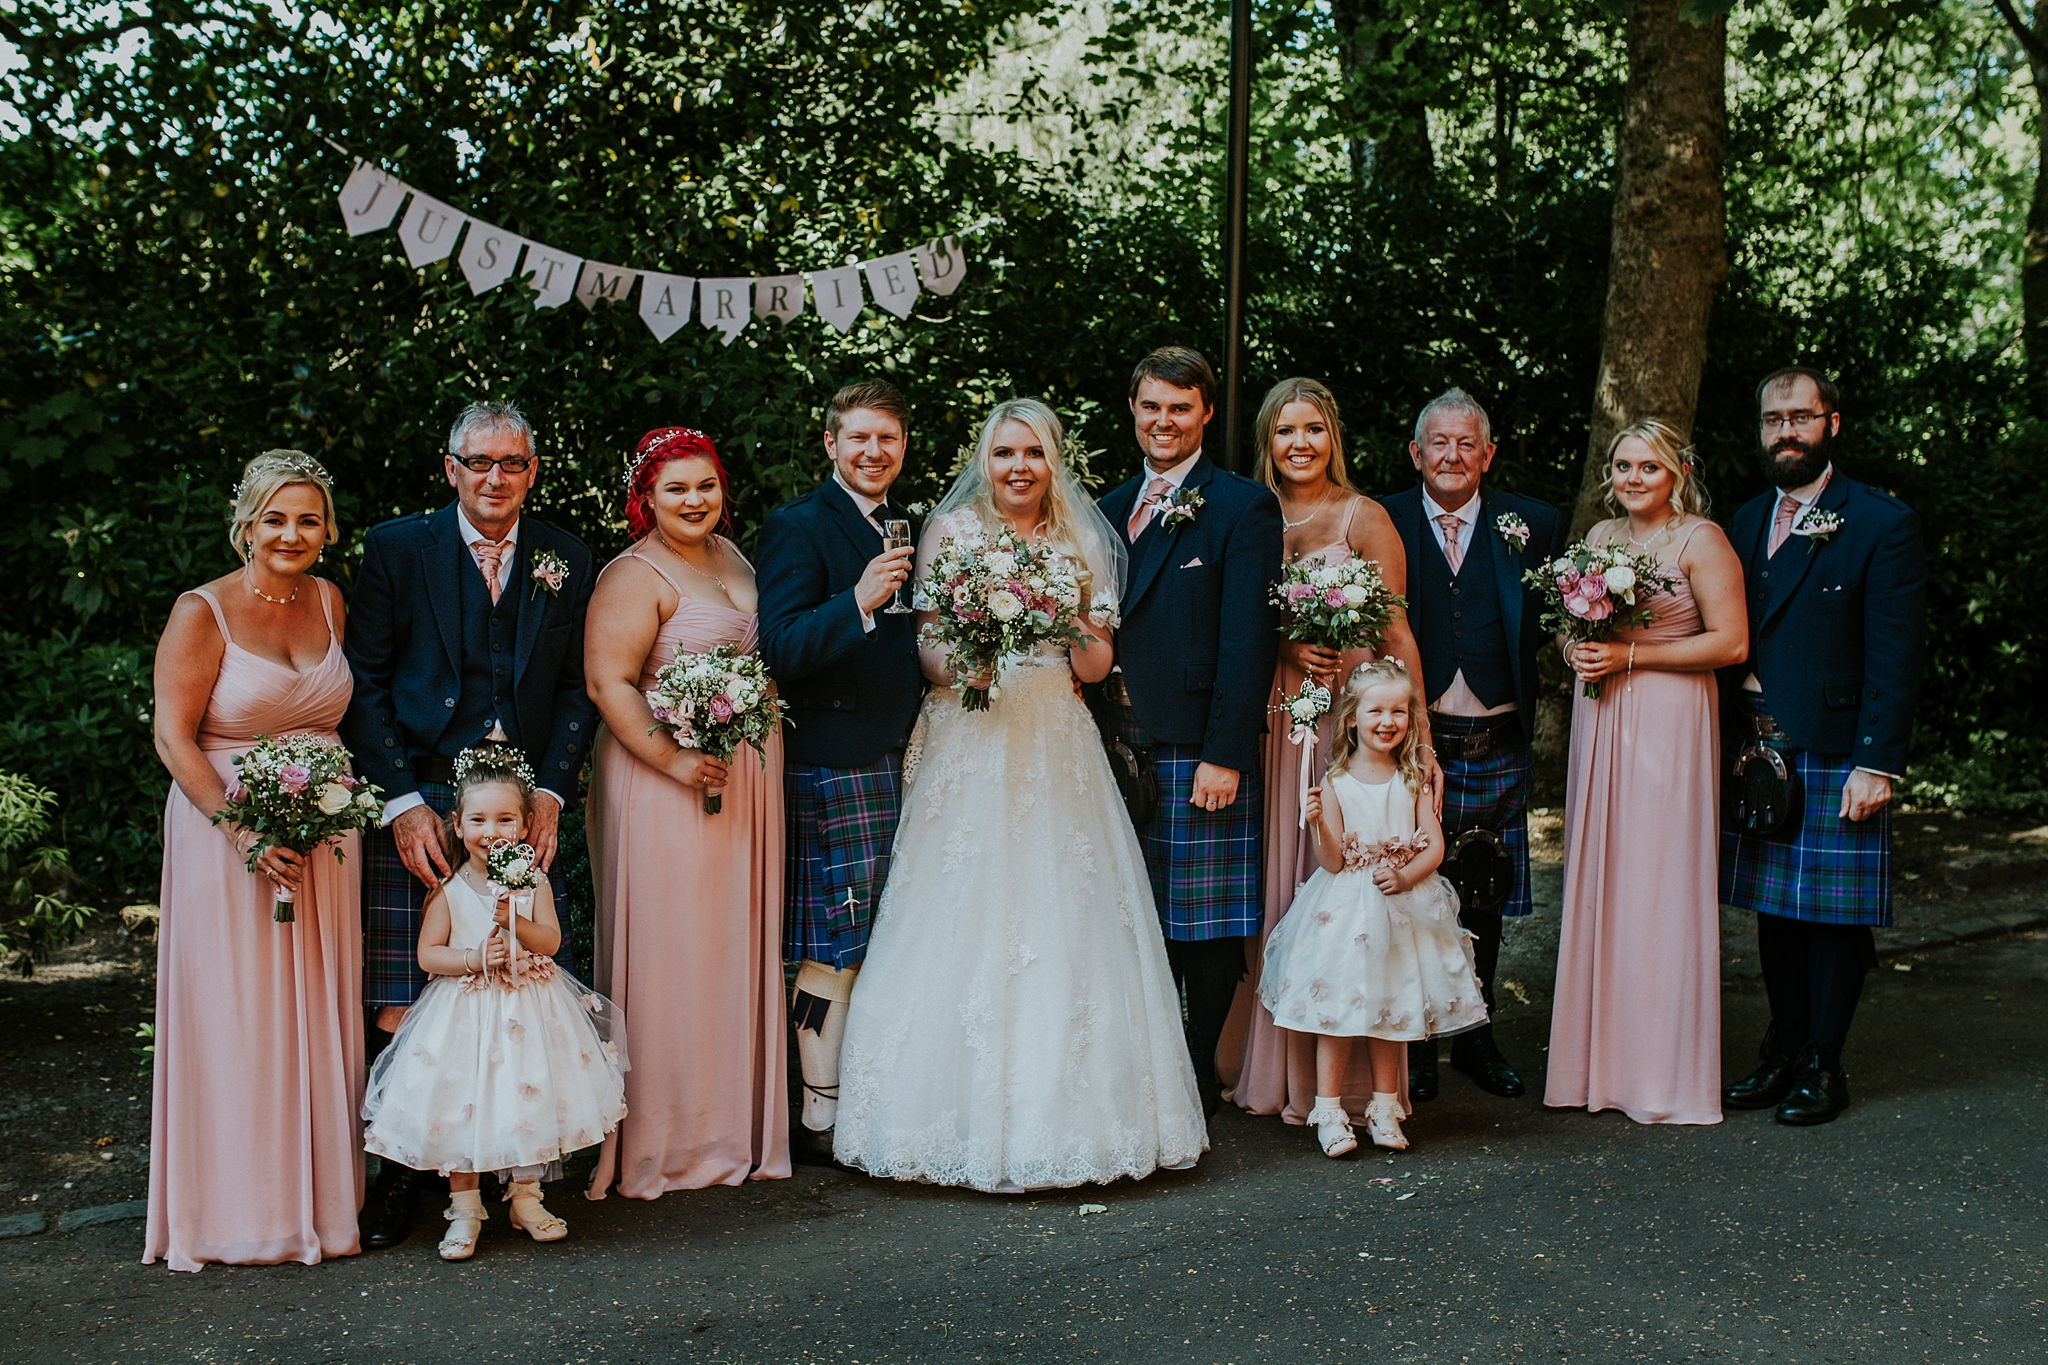 Mark_Alison_Pollockshields_Burgh_Hall_Wedding-33.JPG